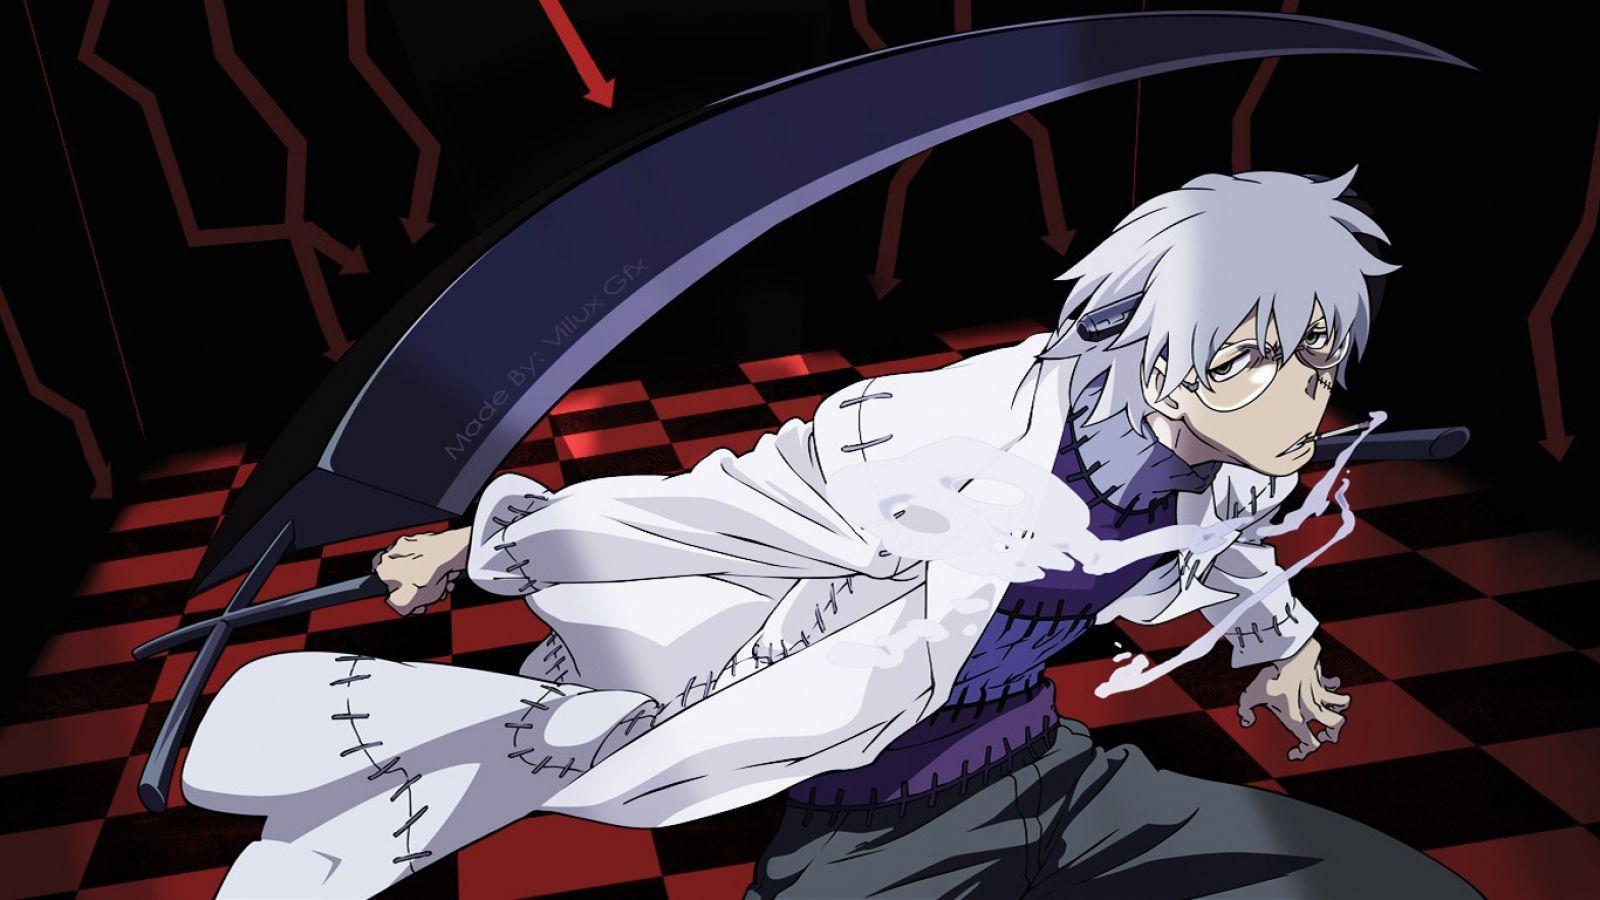 Soul Eater Anime Wallpapers - Top Free Soul Eater Anime ...